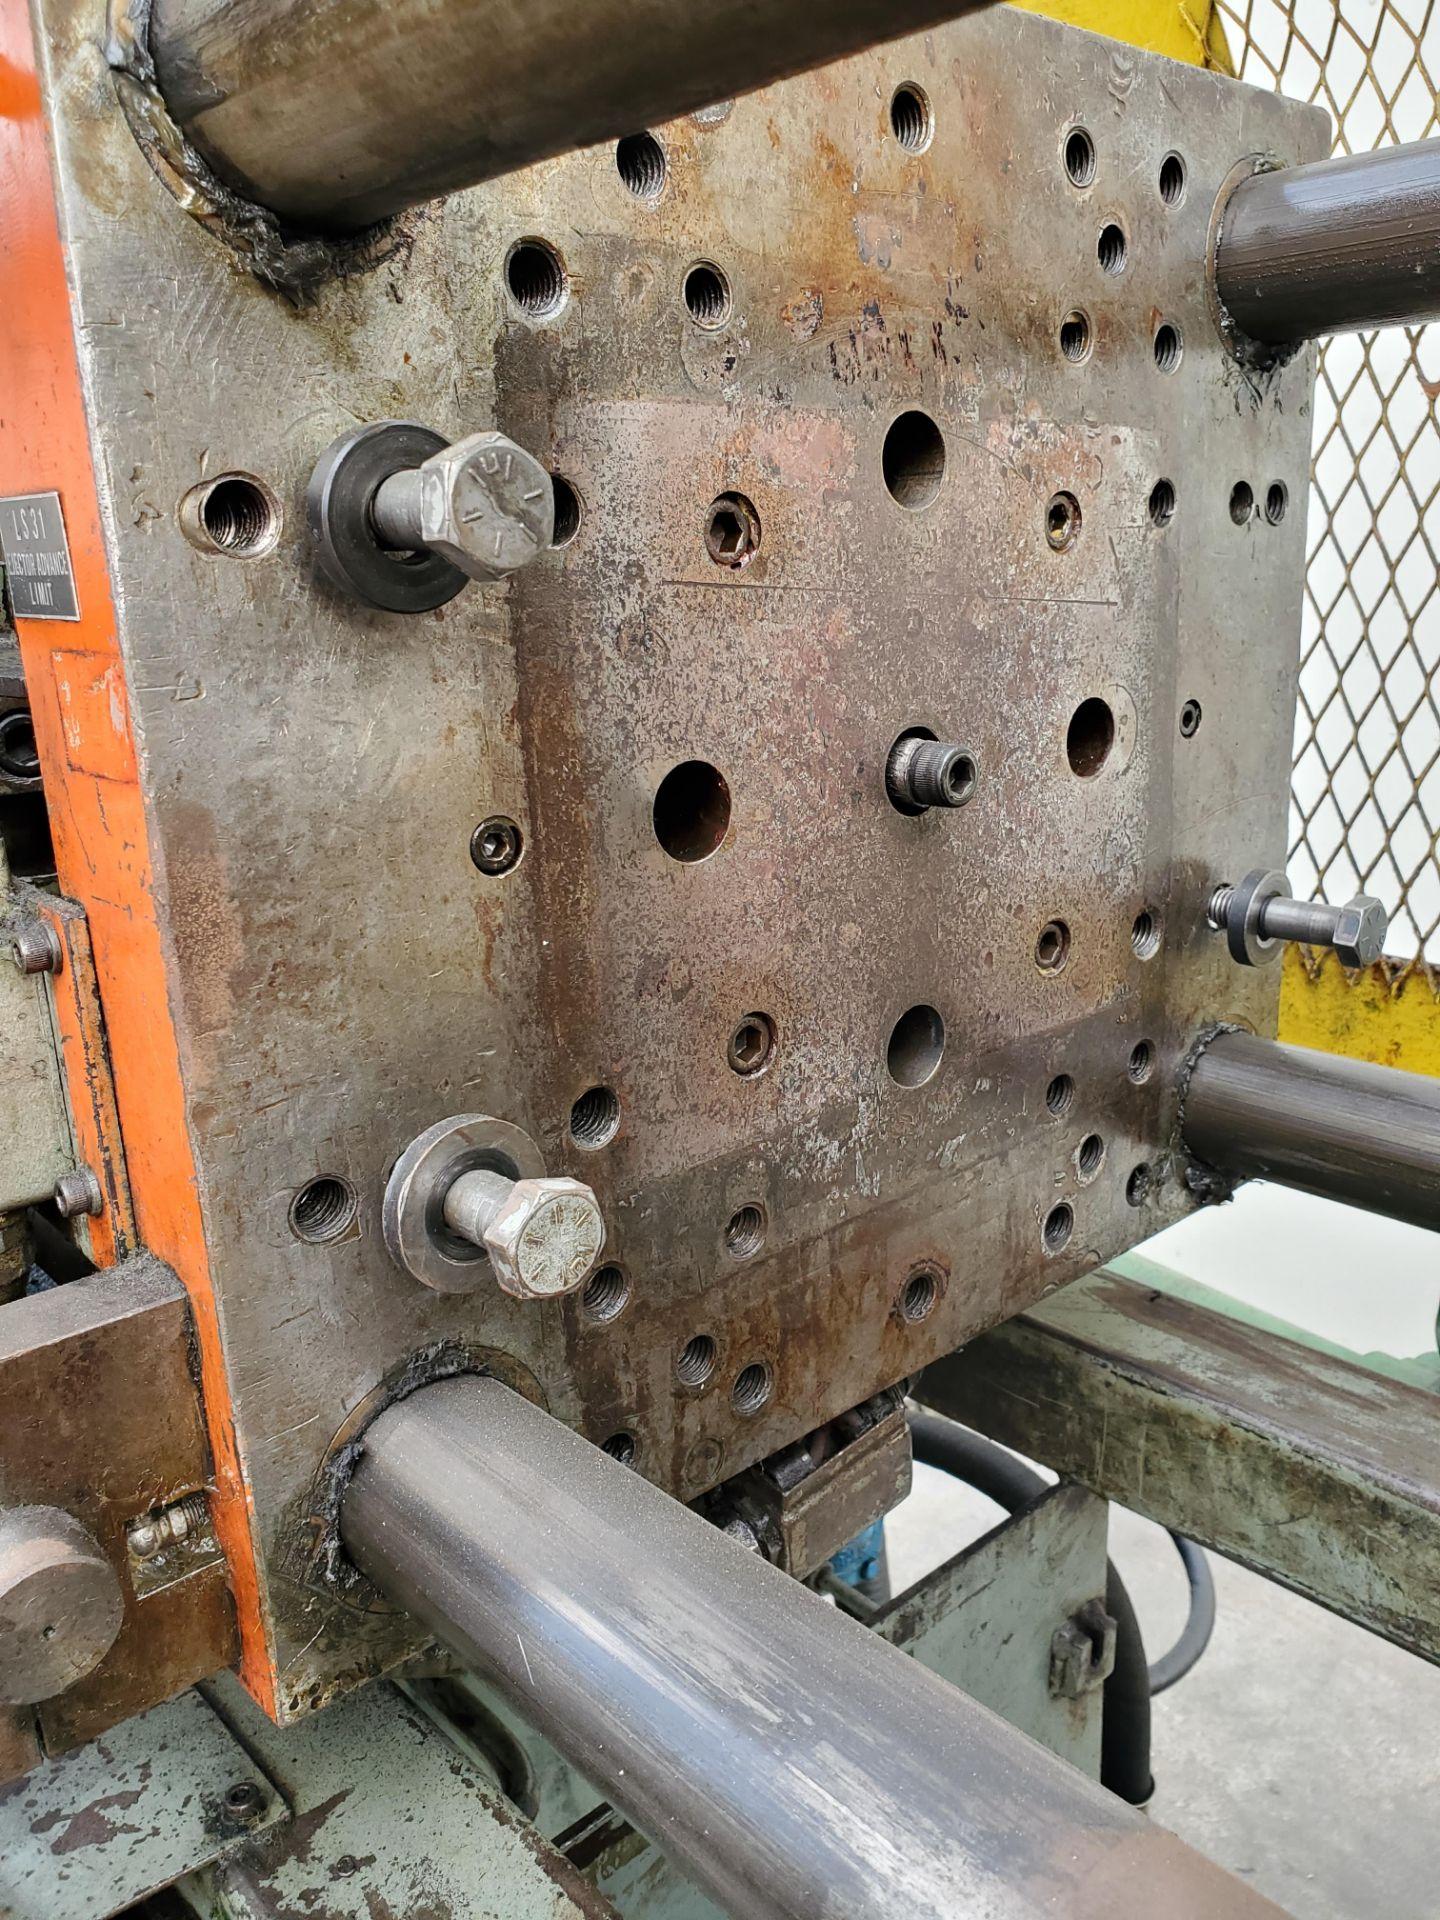 TOSHIBA ISS-85 INJECTION MOLDING MACHINE - Image 6 of 6